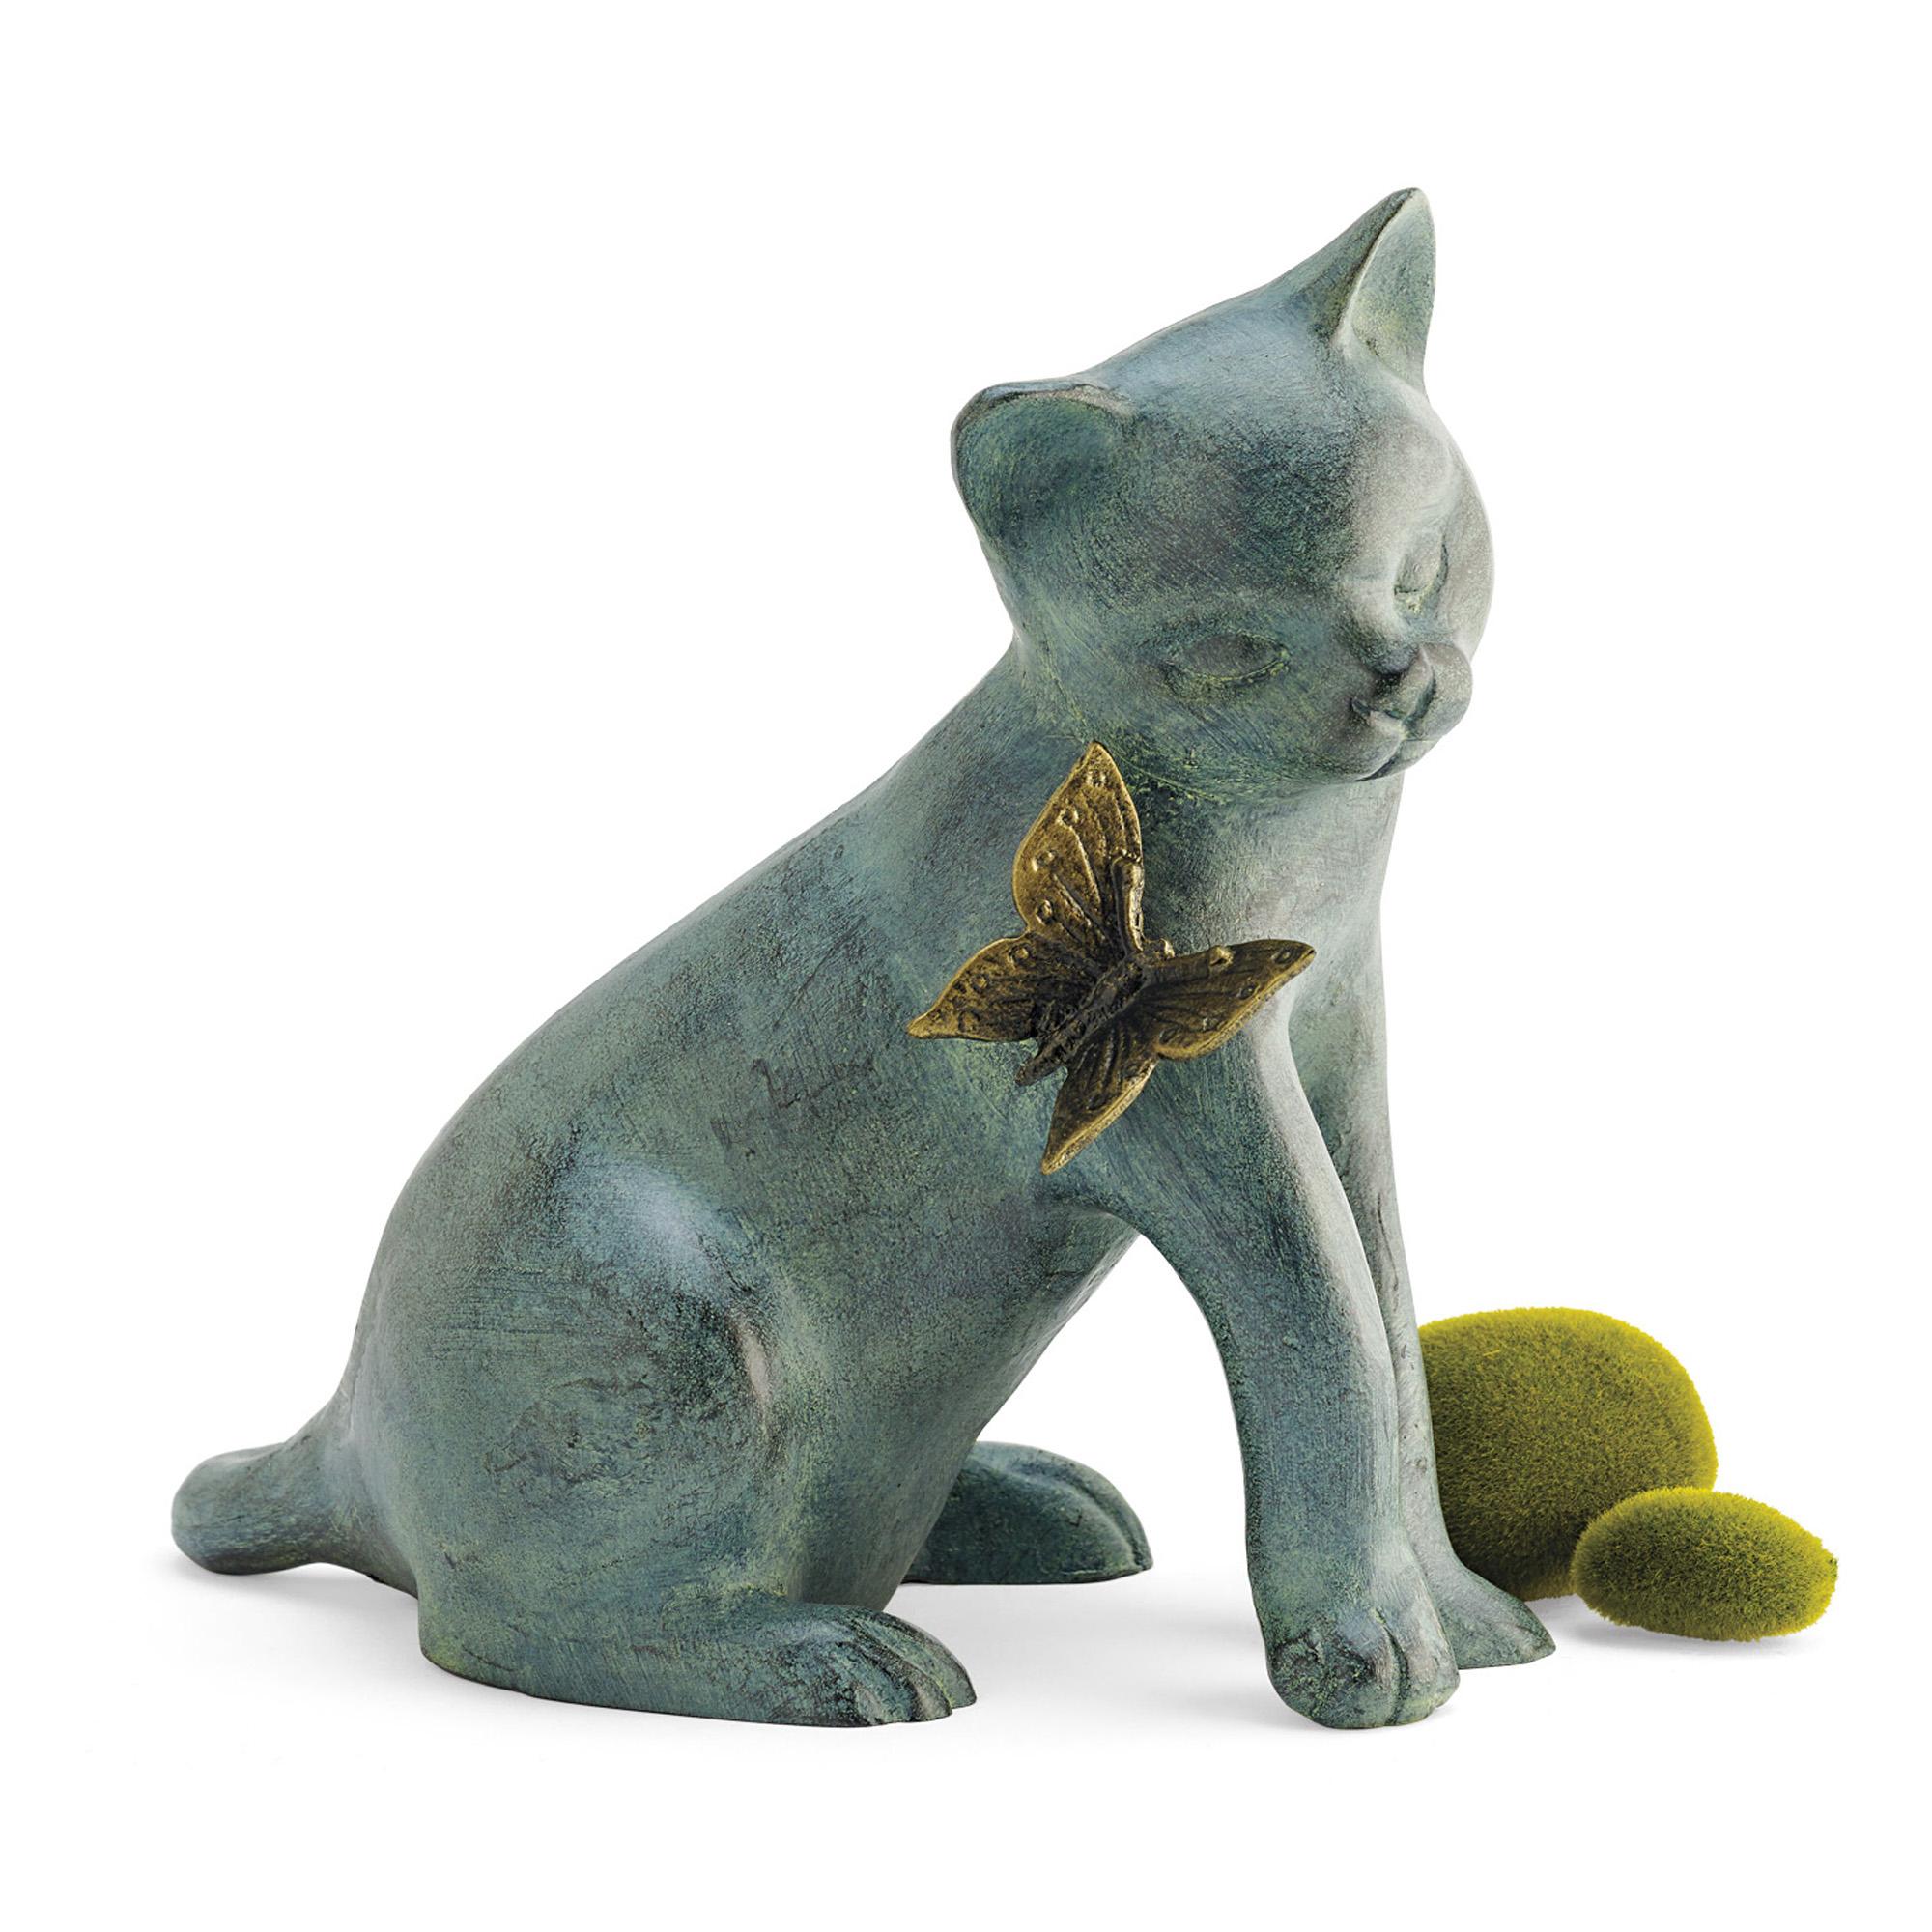 stone cfm statue cat master cast garden hayneedle pumpkin international a campania on product